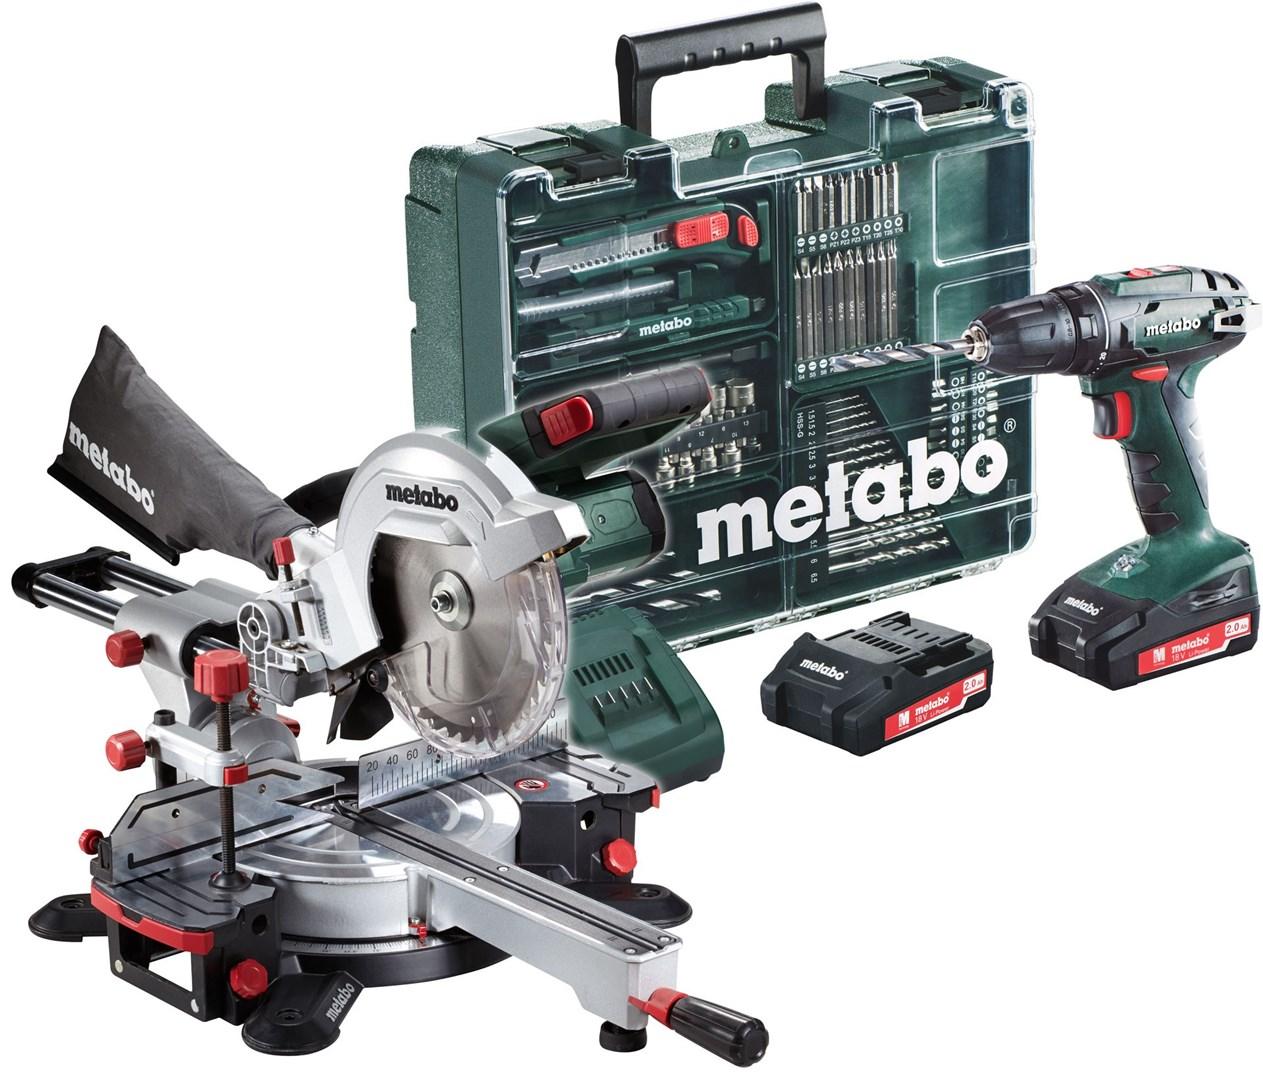 metabo kgs 18 ltx 216 solo bs 18 2x pakke med kapp og gj rsag og borskrutrekker med stor. Black Bedroom Furniture Sets. Home Design Ideas